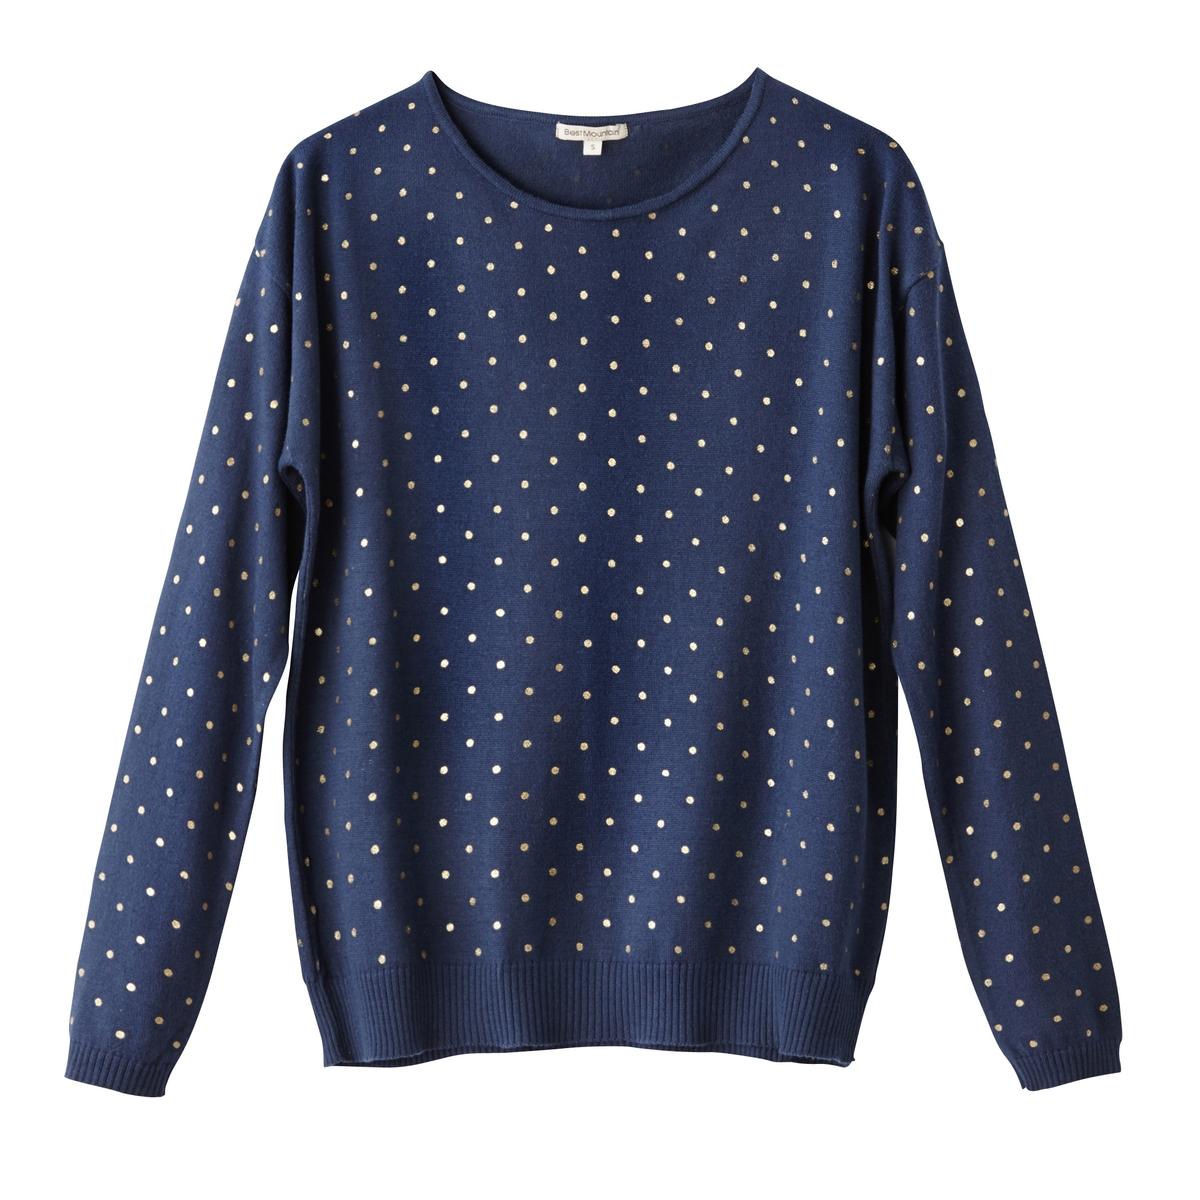 BEST MOUNTAIN Пуловер в горошек, 100% хлопка